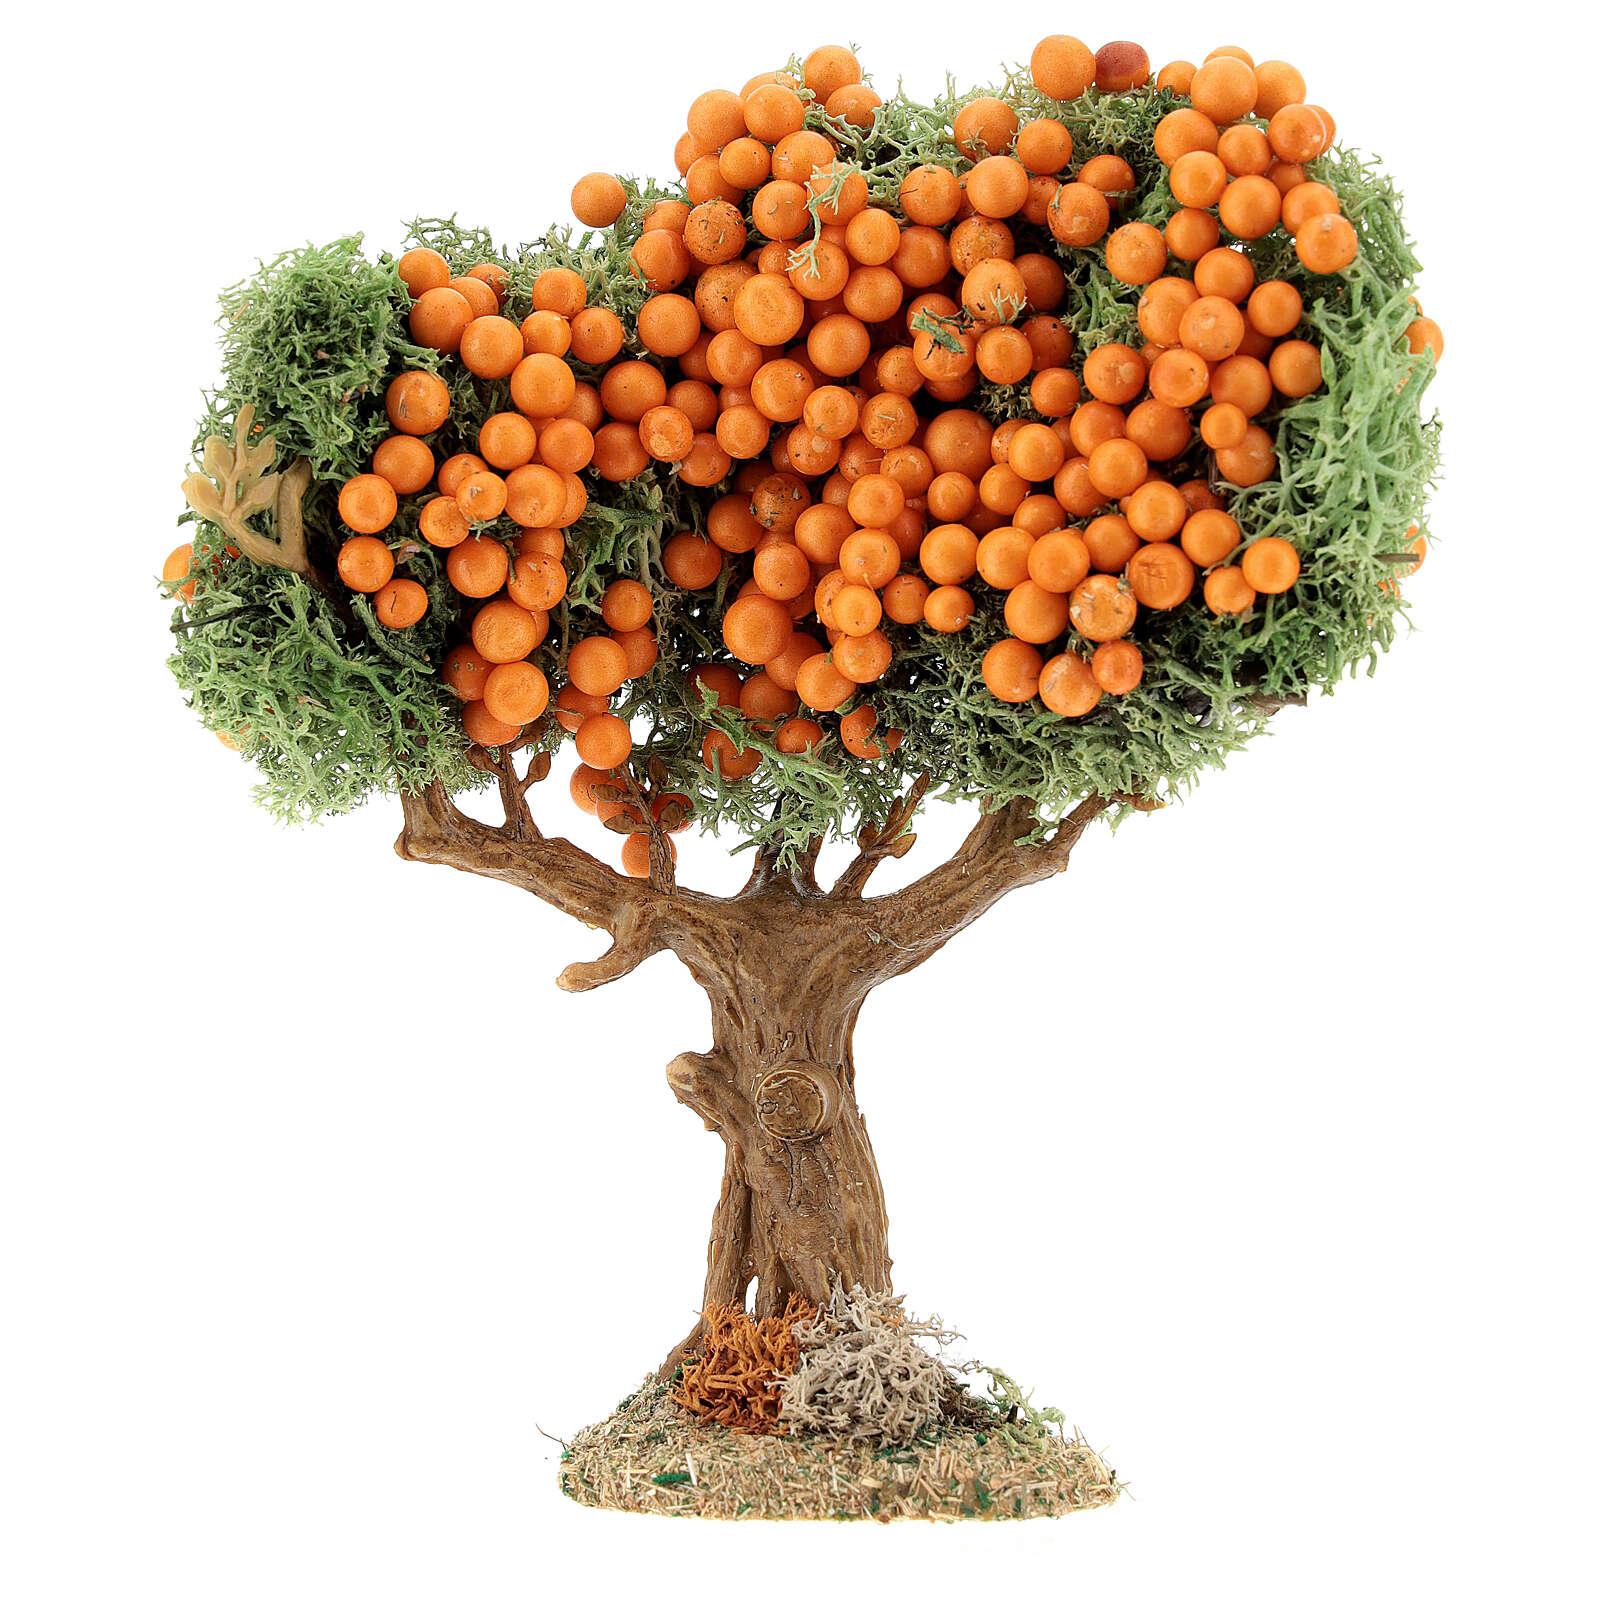 Albero frutta presepe h 16 cm per statue 8-12 cm 4